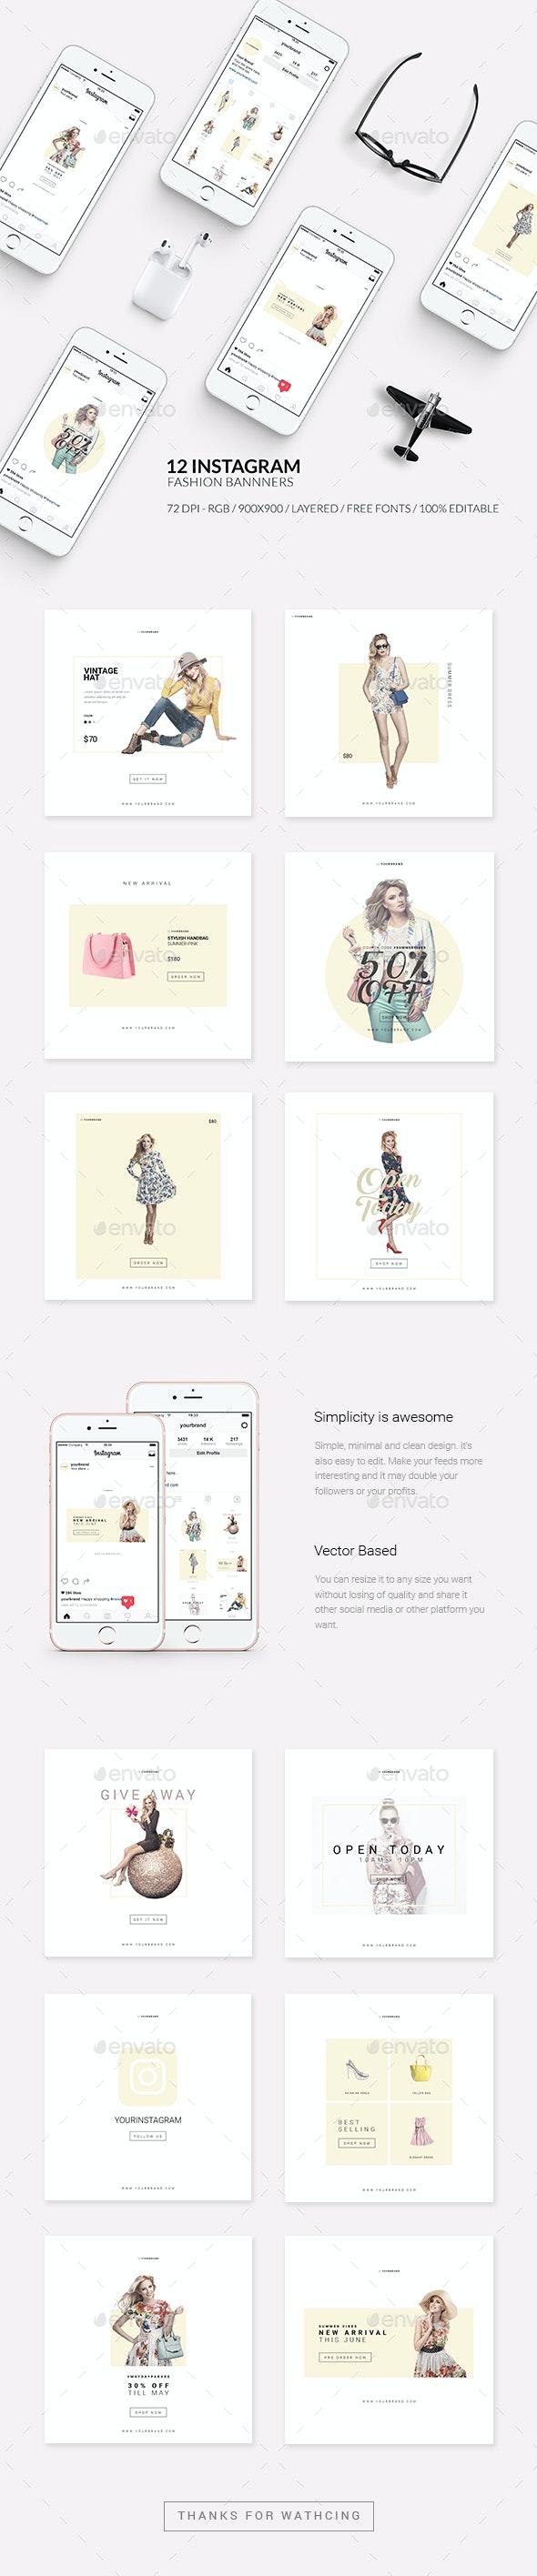 Fashion Instagram Promotional Template - Web Elements